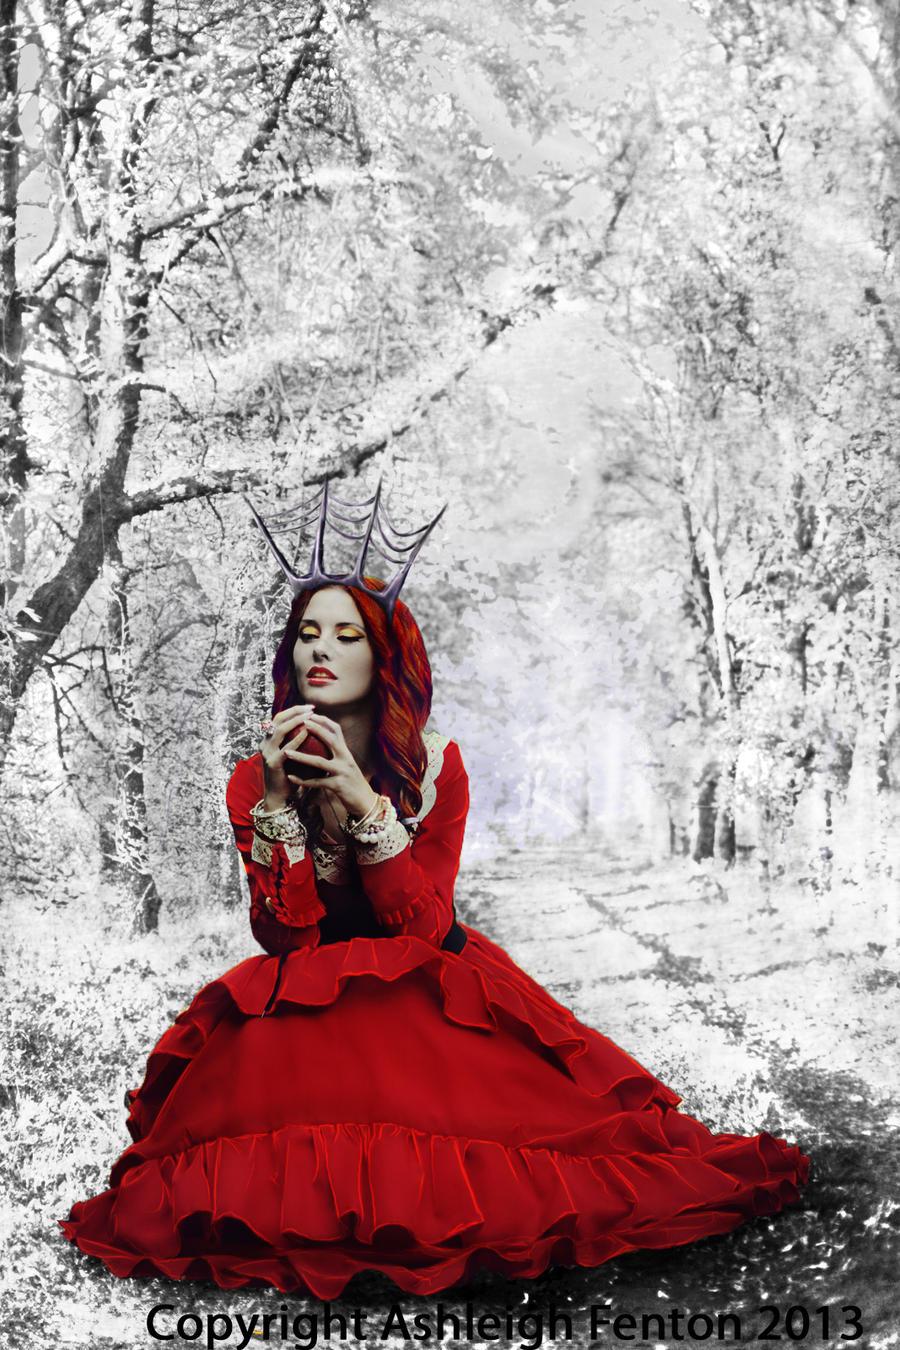 Winter's Blush by celloismistic